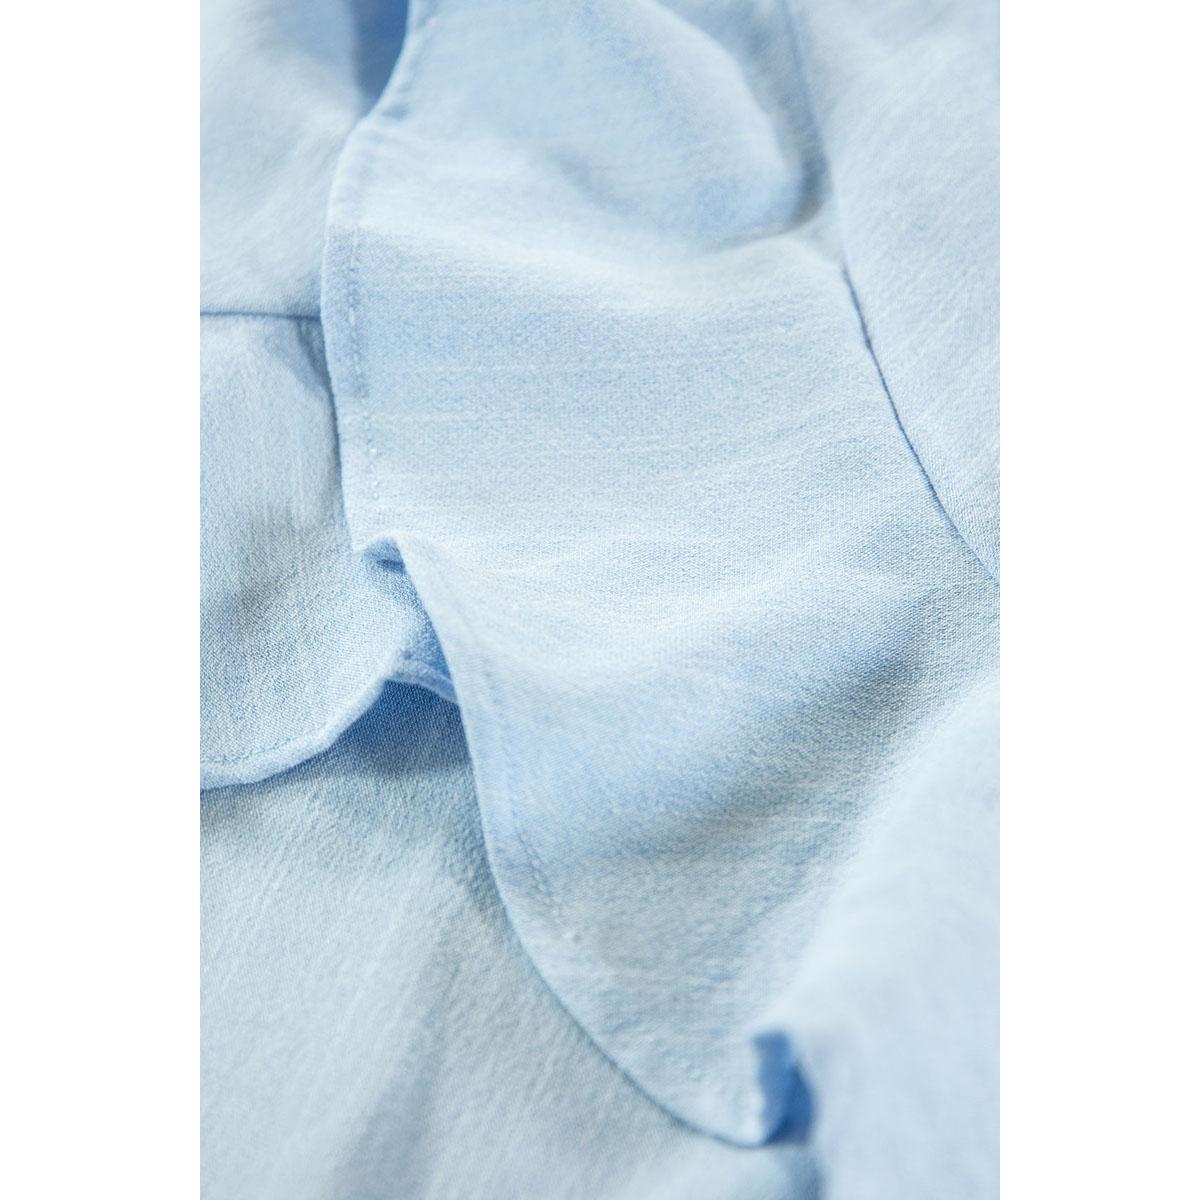 d90283 garcia jurk 223 indigo blue